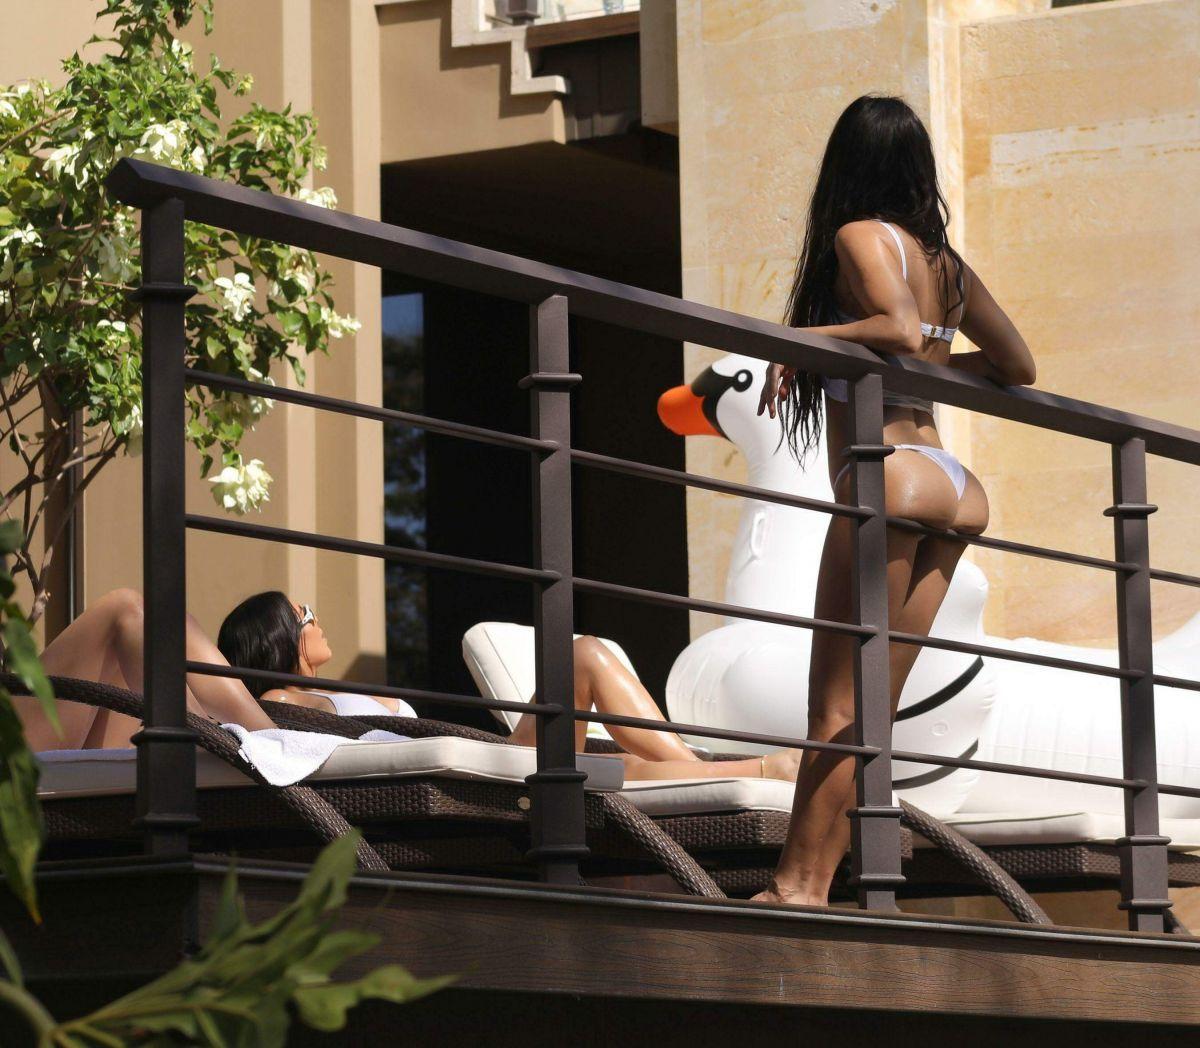 KOURTNEY, KIM and KHLOE KARDASHIAN in Bikinis on Vacation in Costa Rica 01/31/2017